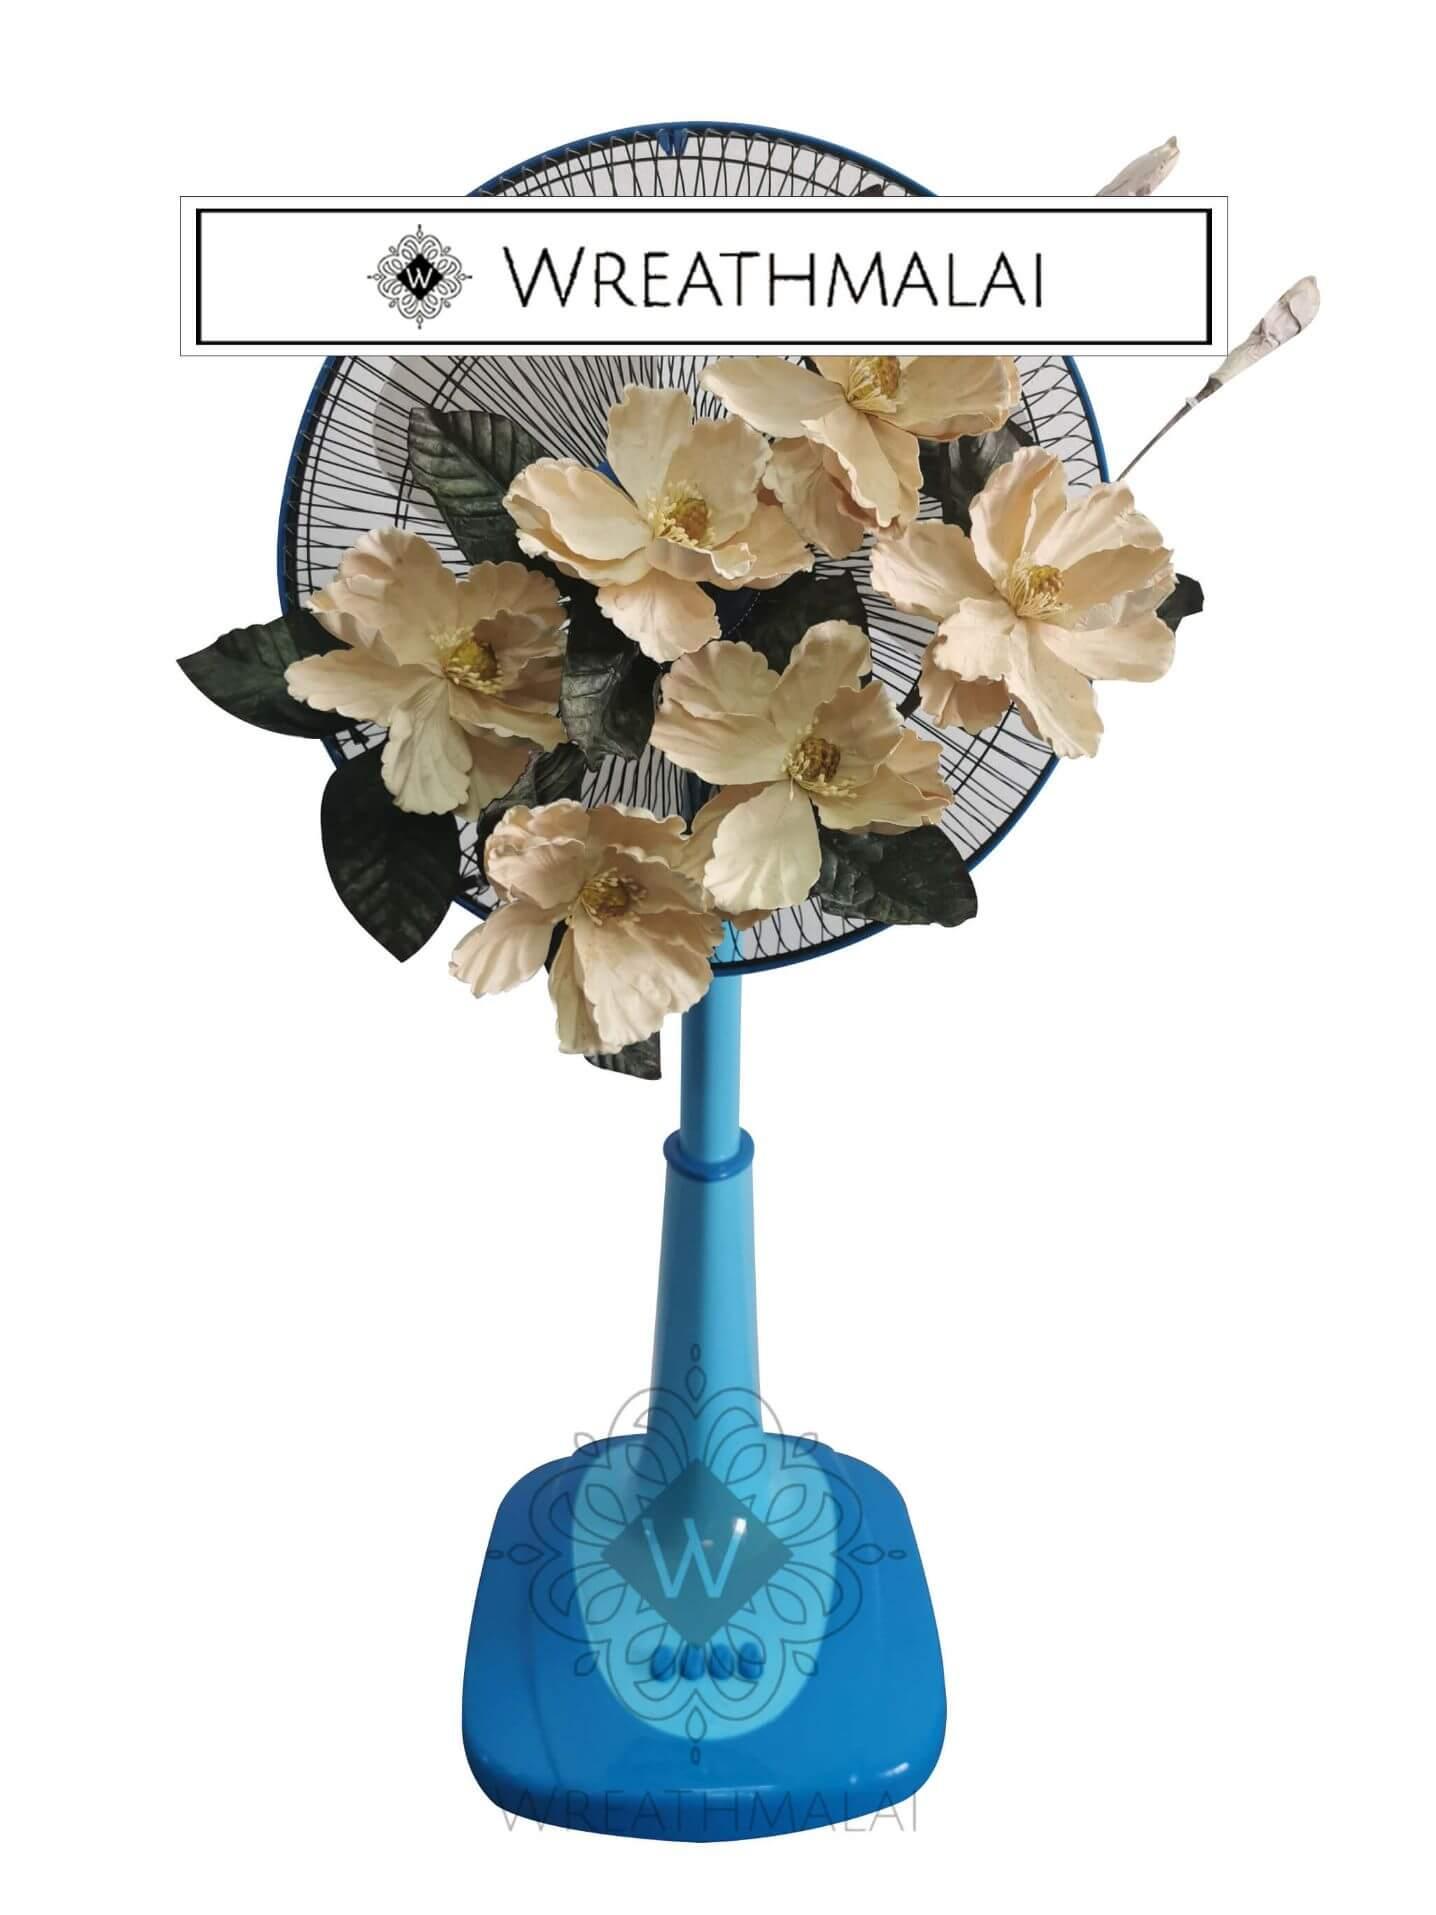 WF005 พวงหรีดพัดลมประดับดอกไม้สีขาวฟ้า ตั้งพื้น ยืดได้  Airy 16 นิ้ว